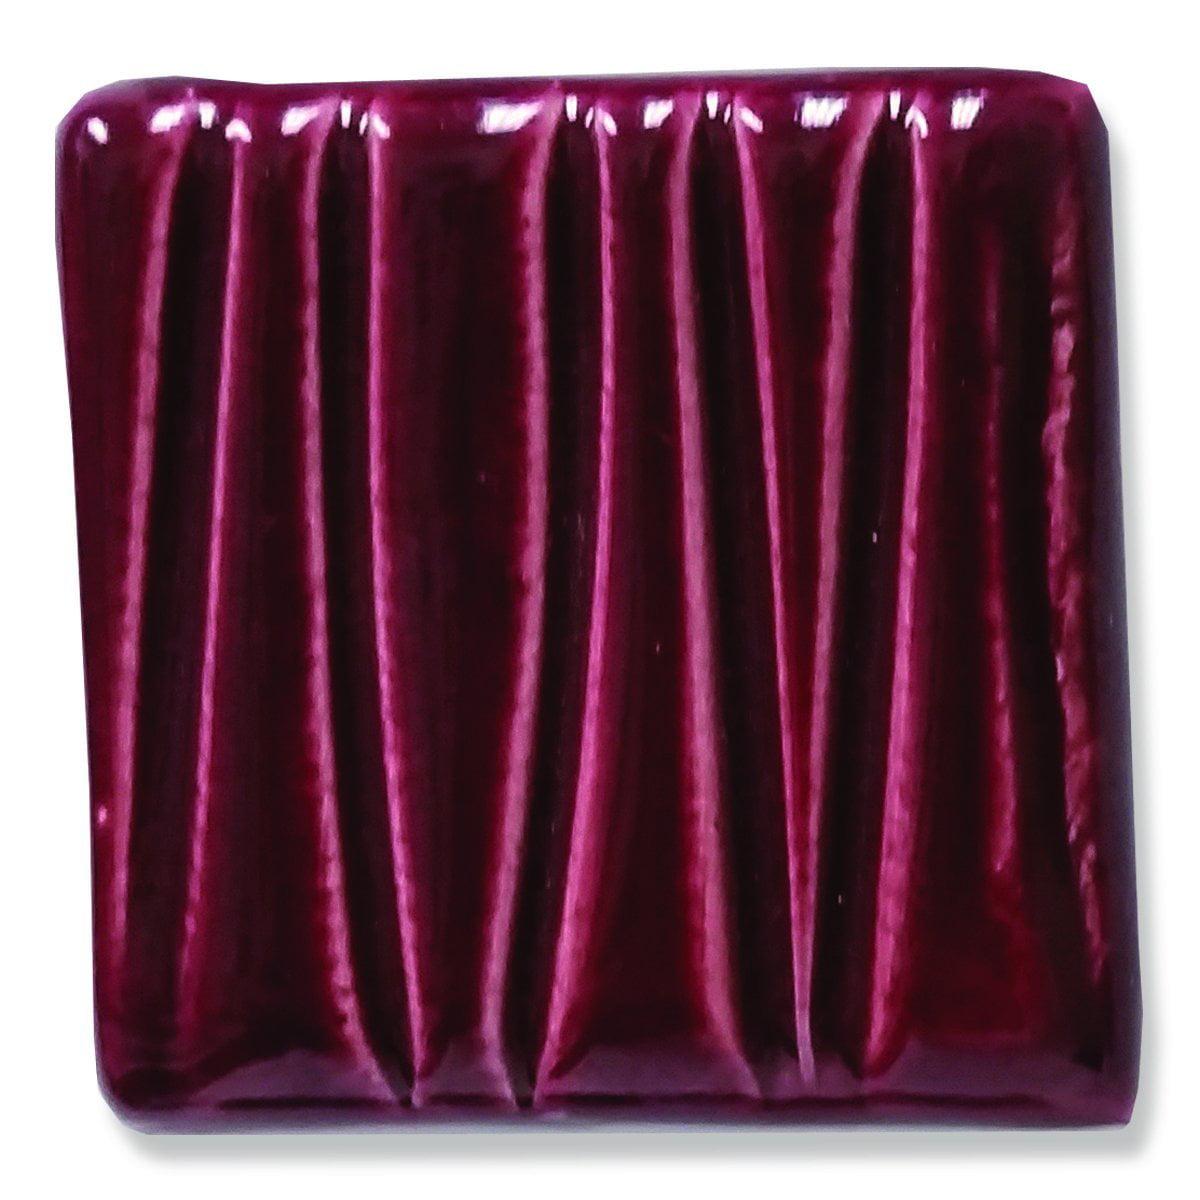 Speedball Art 16 oz. (pint) Earthenware Glaze--Burgundy